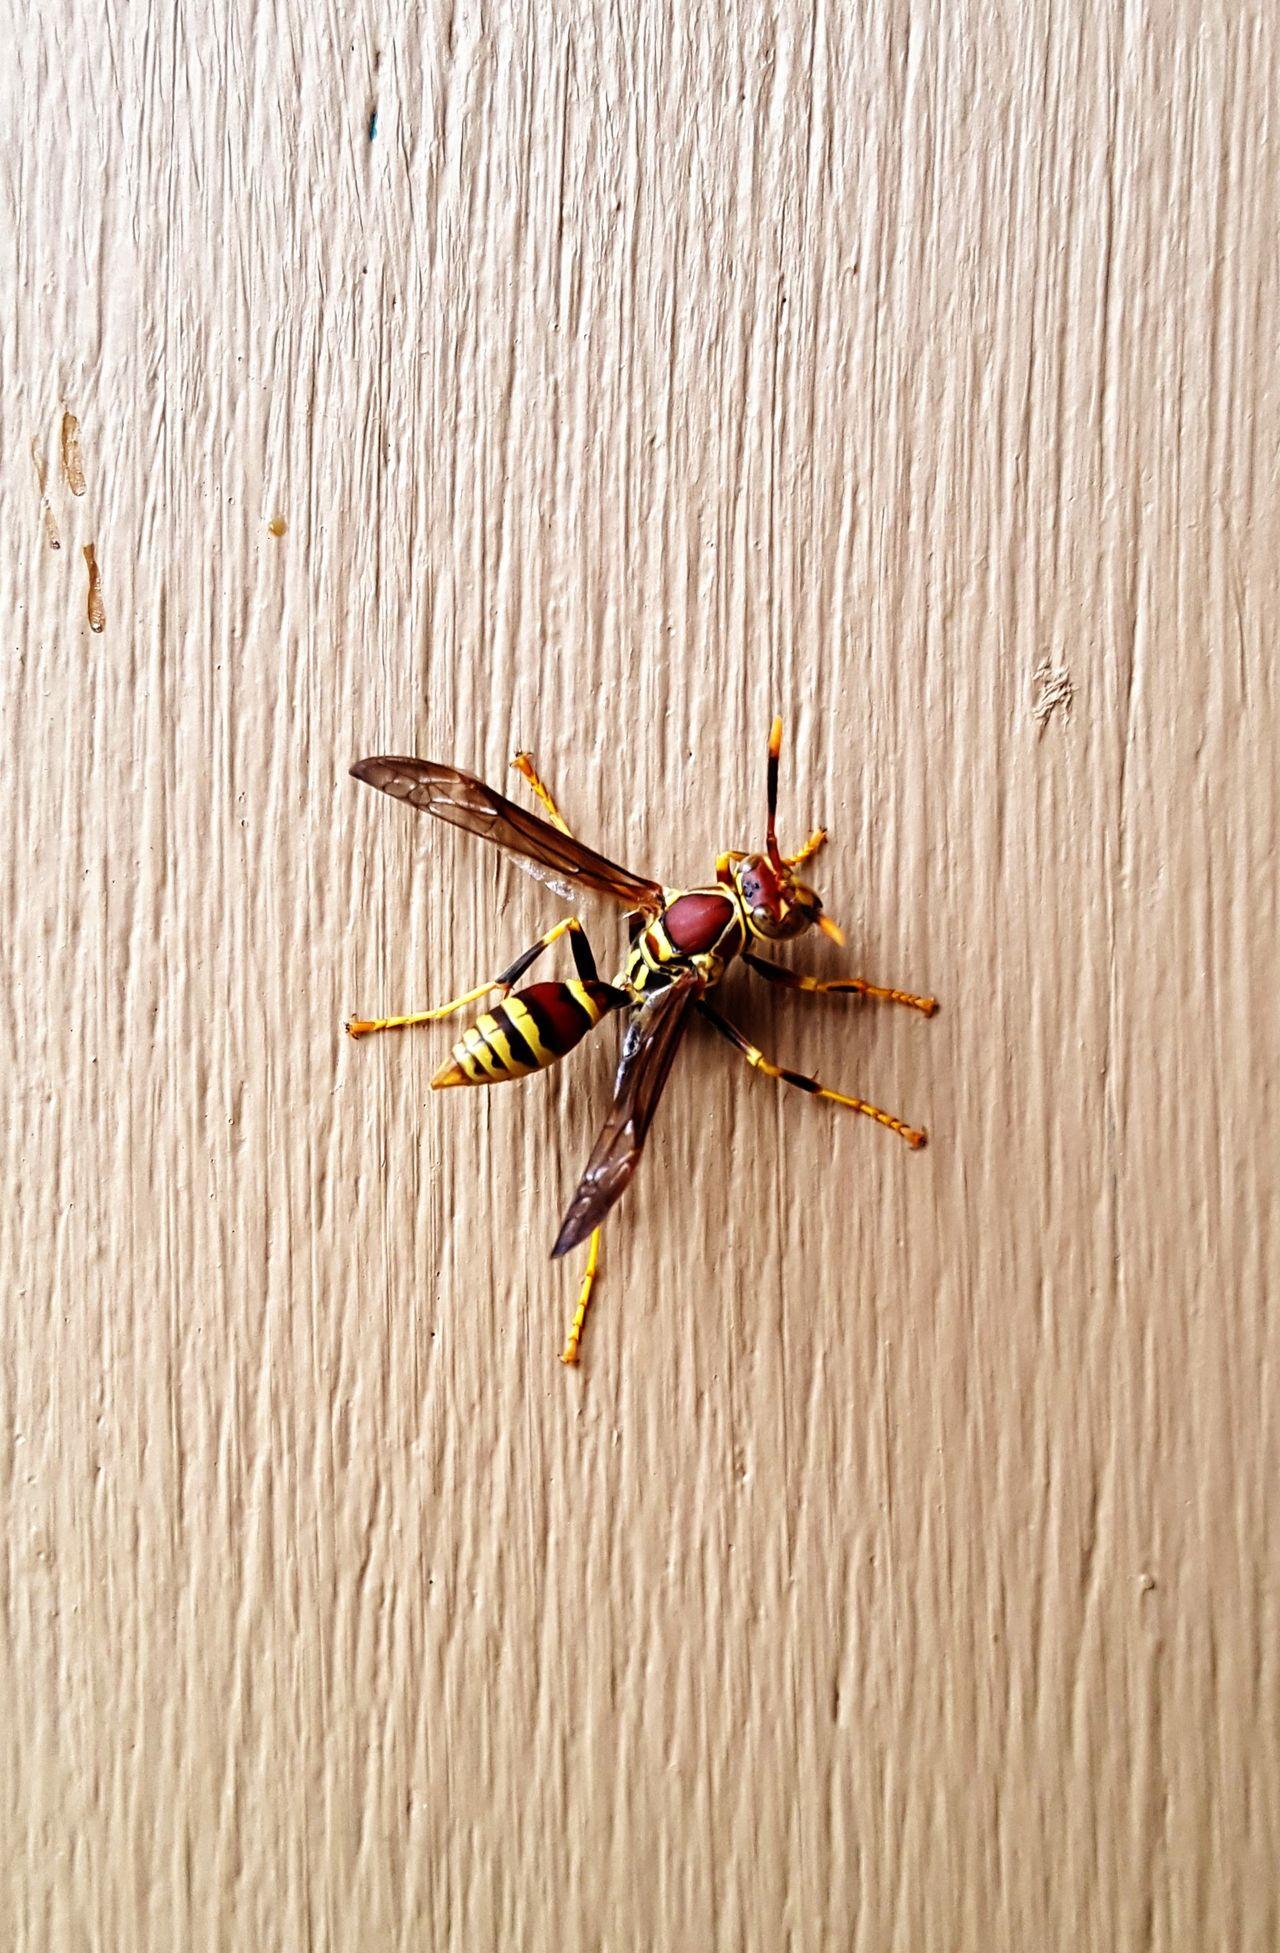 Yellow Jacket on Painted Wood Door Beaty Close-up Day Insect No People Wasp Wasp Macro Wood Surface Yellow Jacket